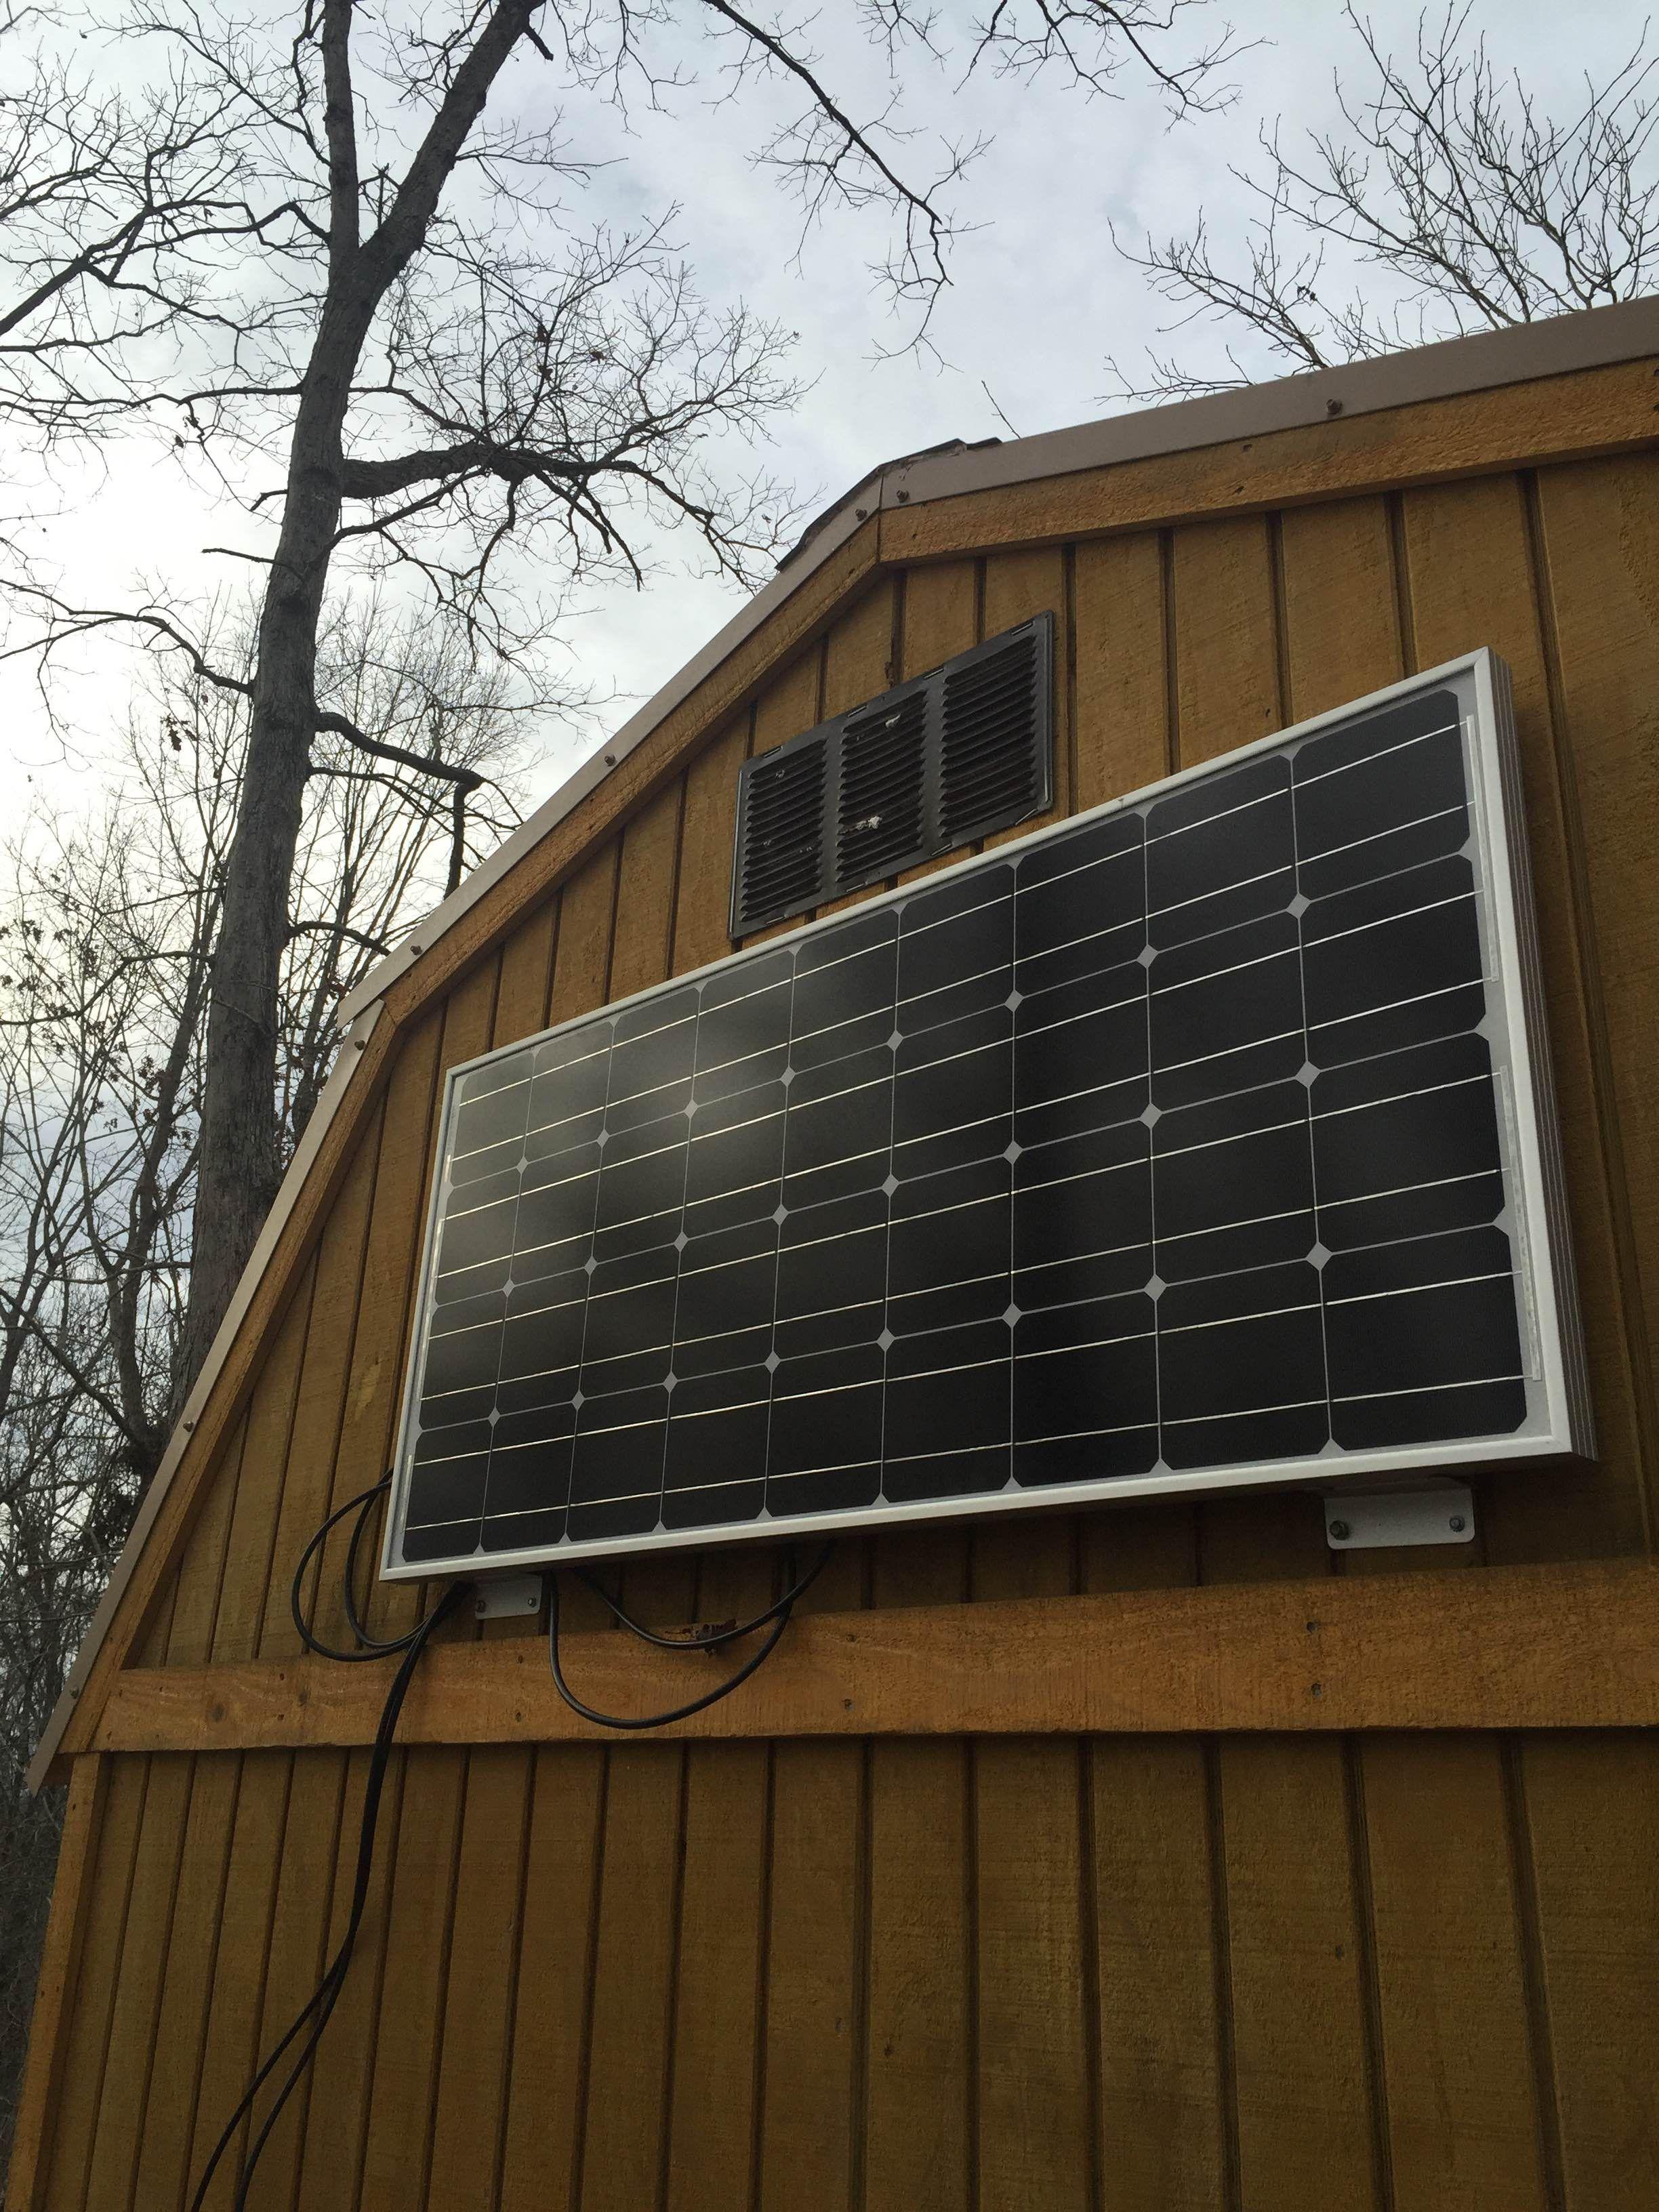 Tiny House Rynogy 100 Watt Solar Panel Mounted Directley To The Tiny House Tiny Cabin Cabin In The Woods 100 Watt Solar Panel Solar Panel Mounts Tiny Cabin